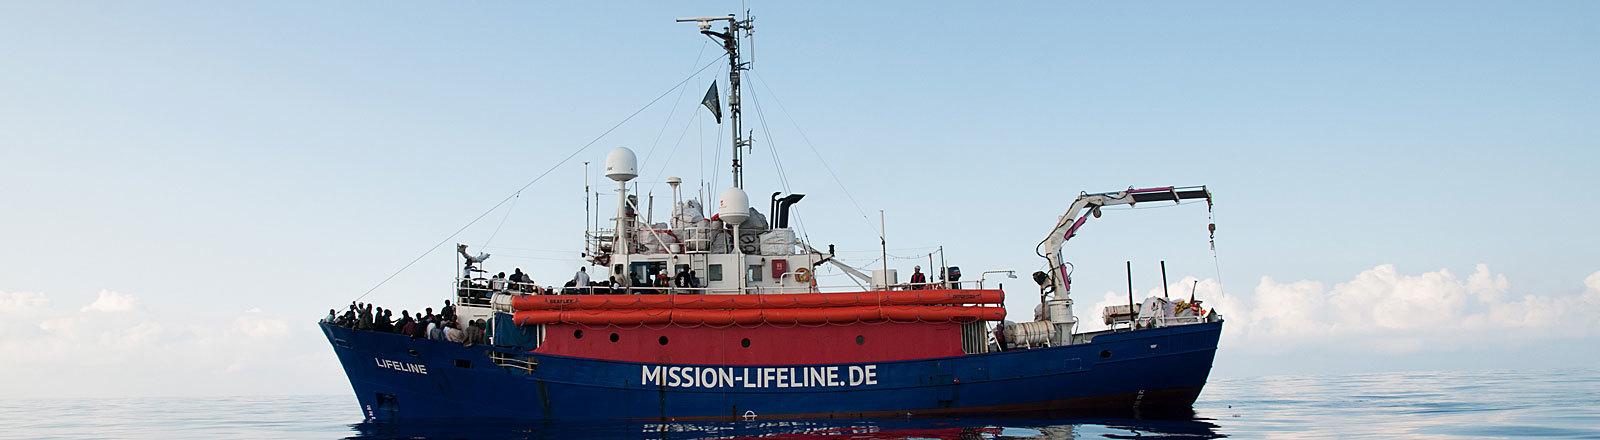 "Rettungsschiff ""Lifeline"" der MISSION LIFELINE e.V."